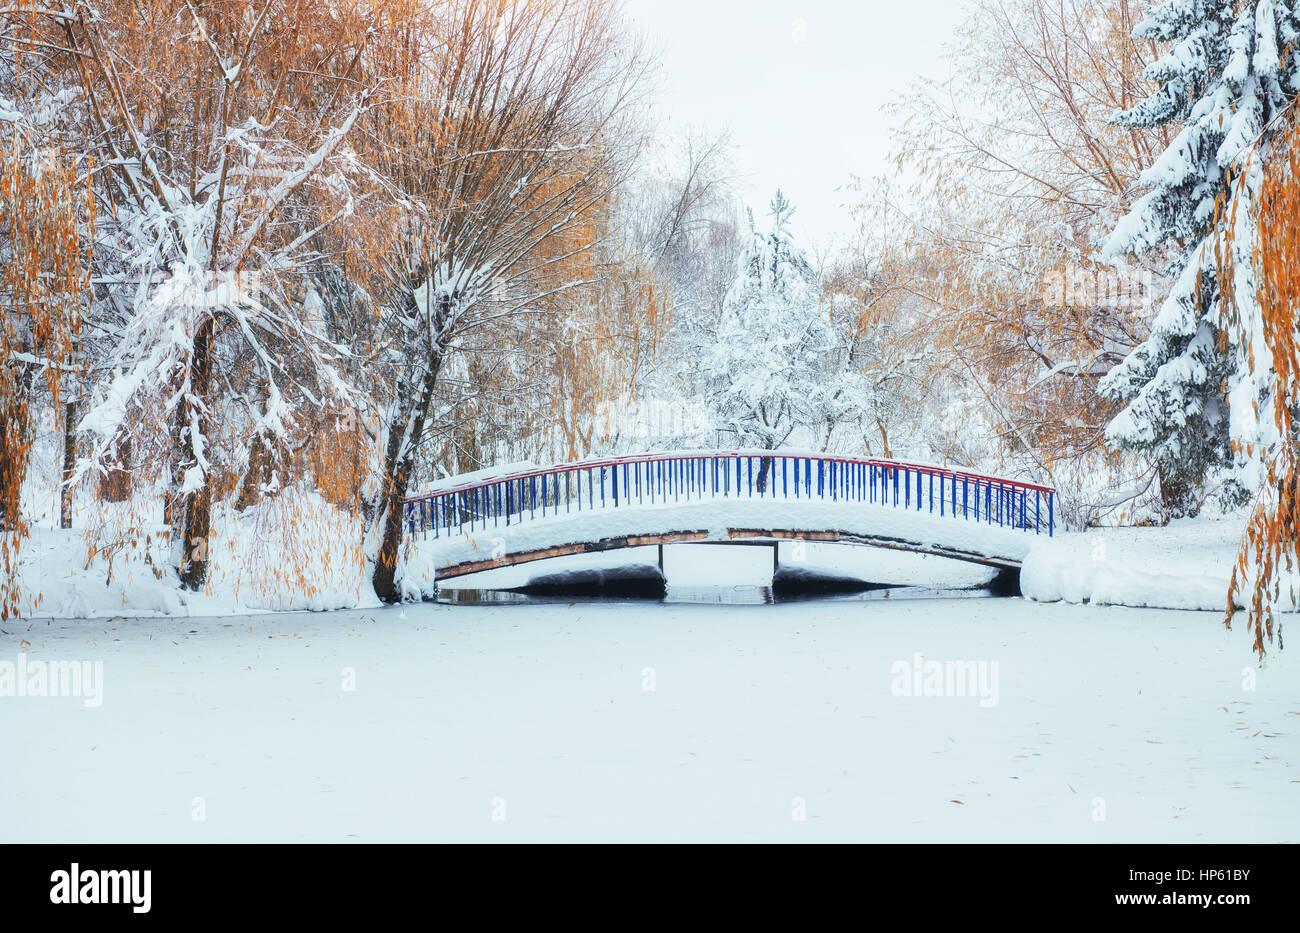 bridge over the river in winter. - Stock Image